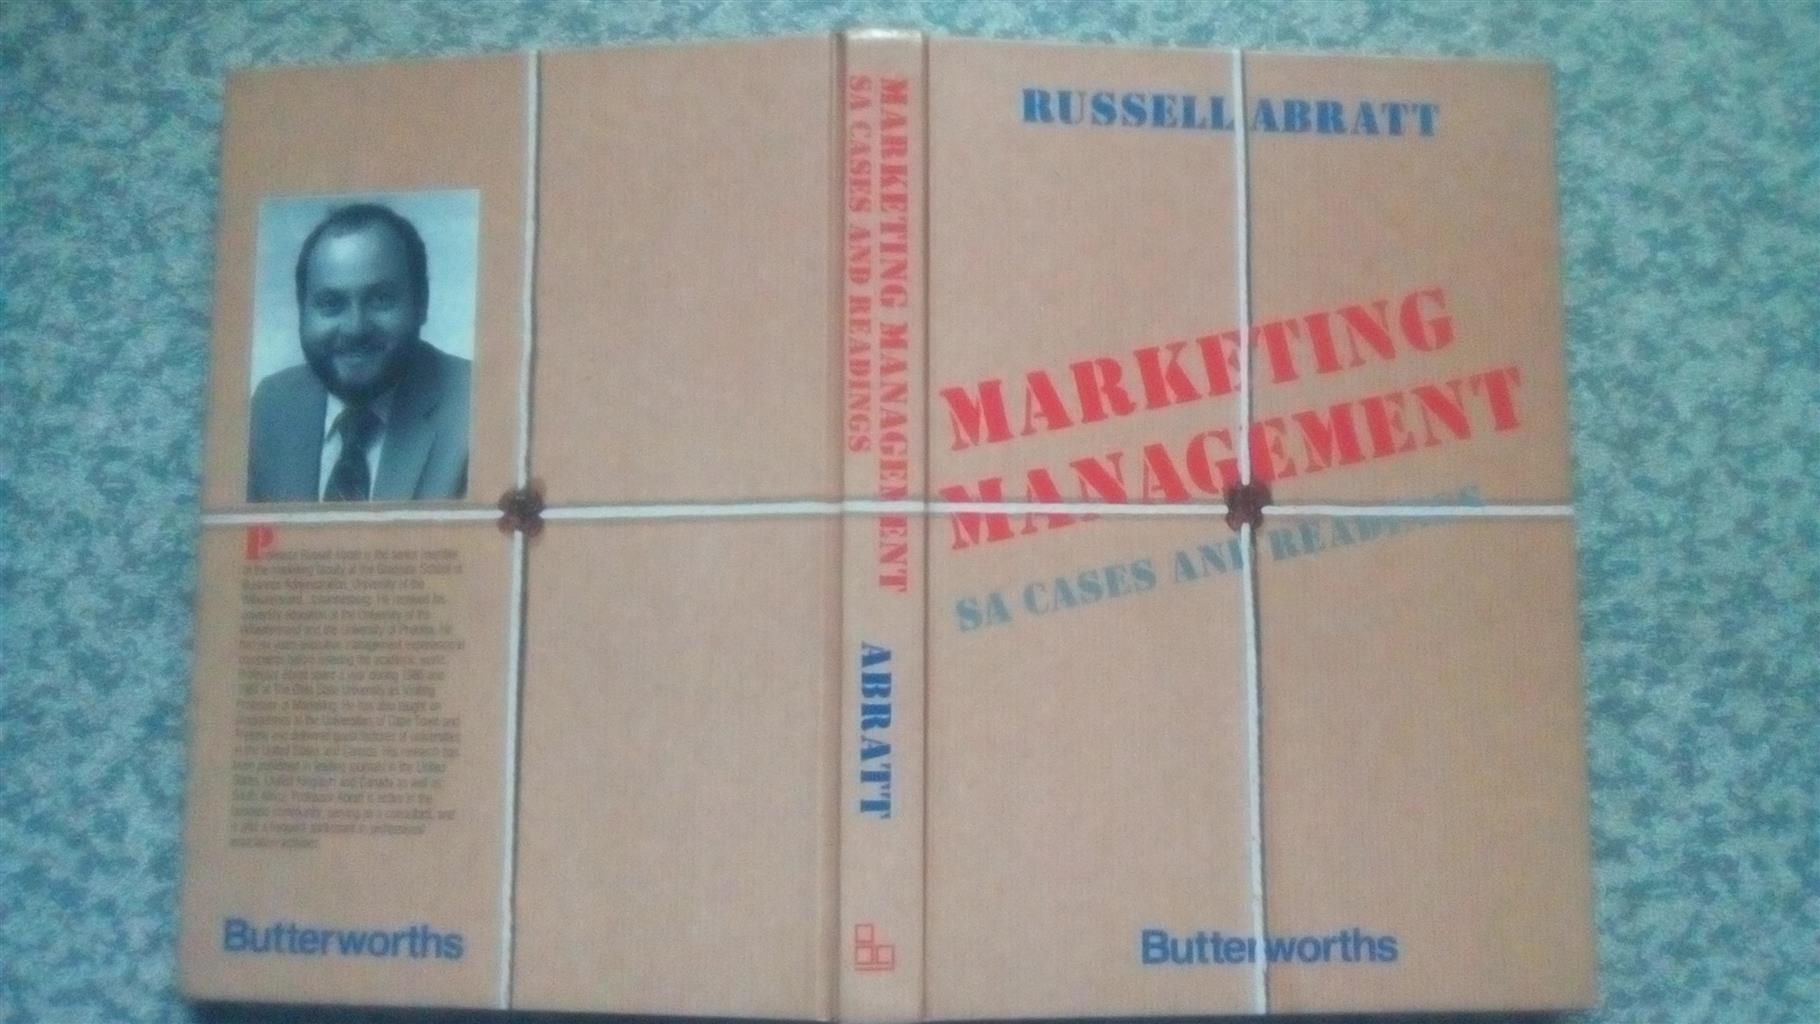 Marketing management by Russell Abratt